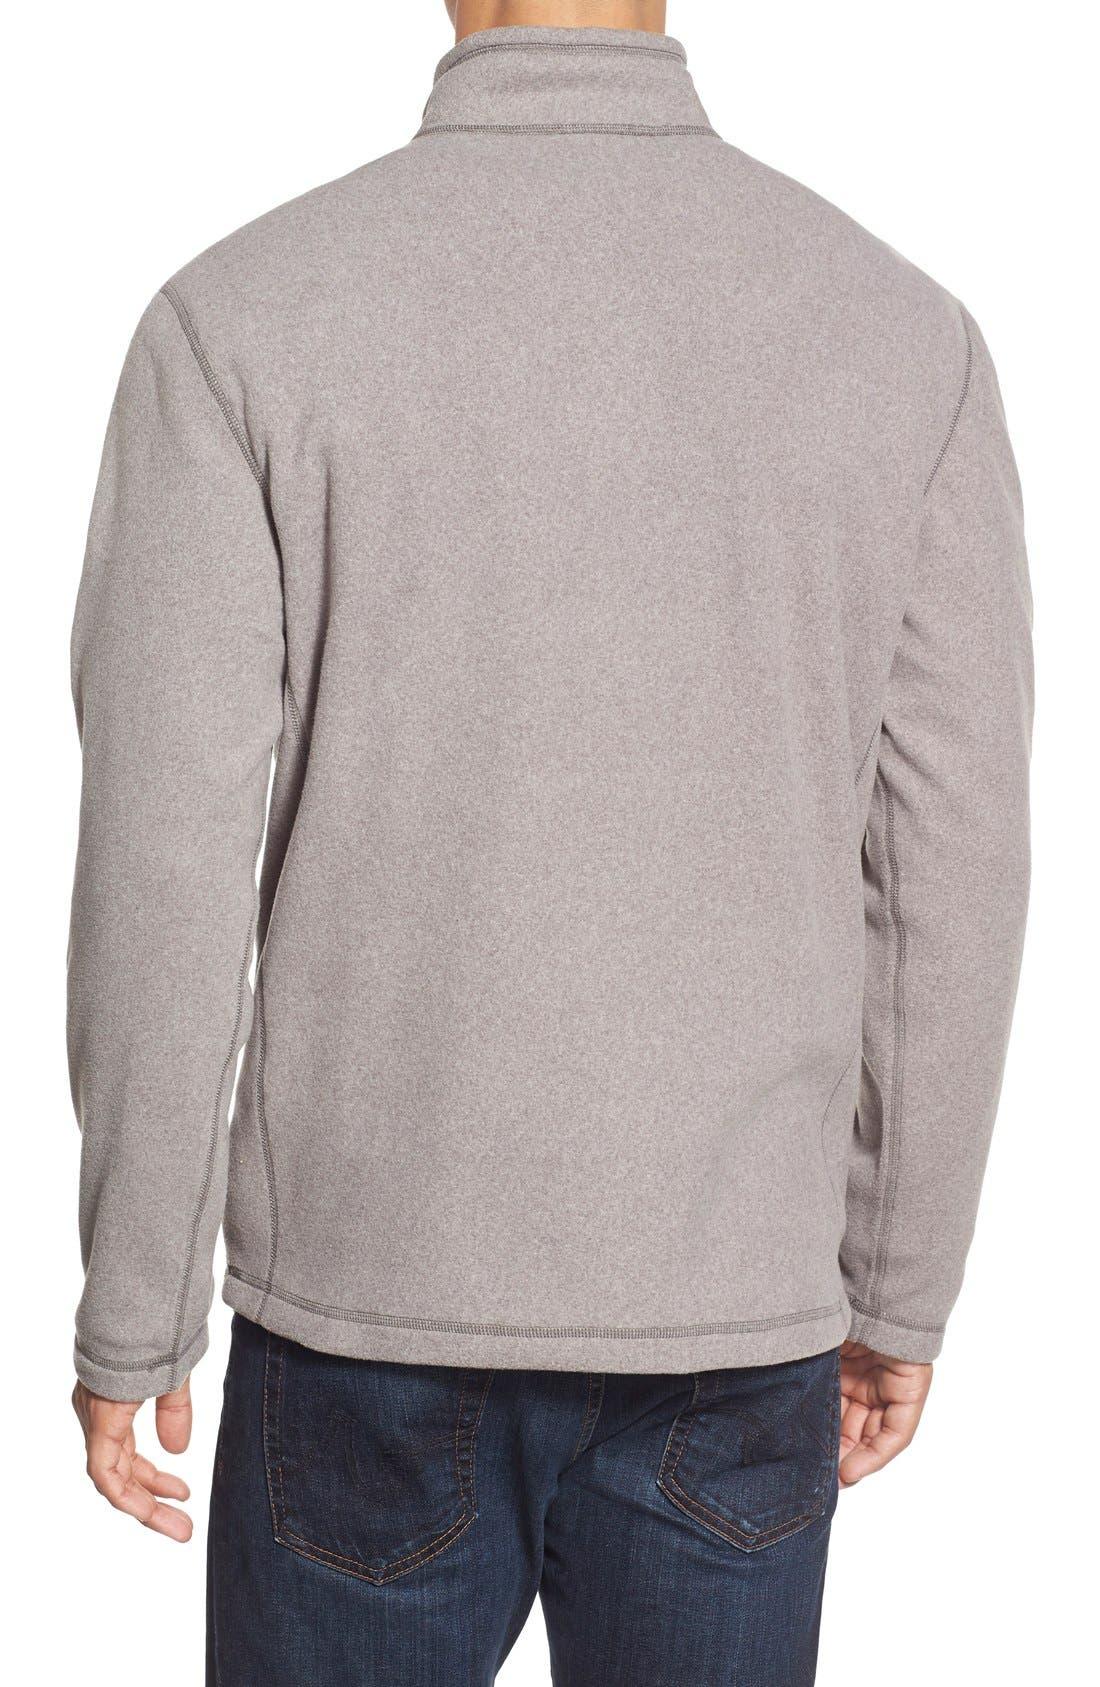 'TKA 100 Glacier' Quarter Zip Fleece Pullover,                             Alternate thumbnail 67, color,